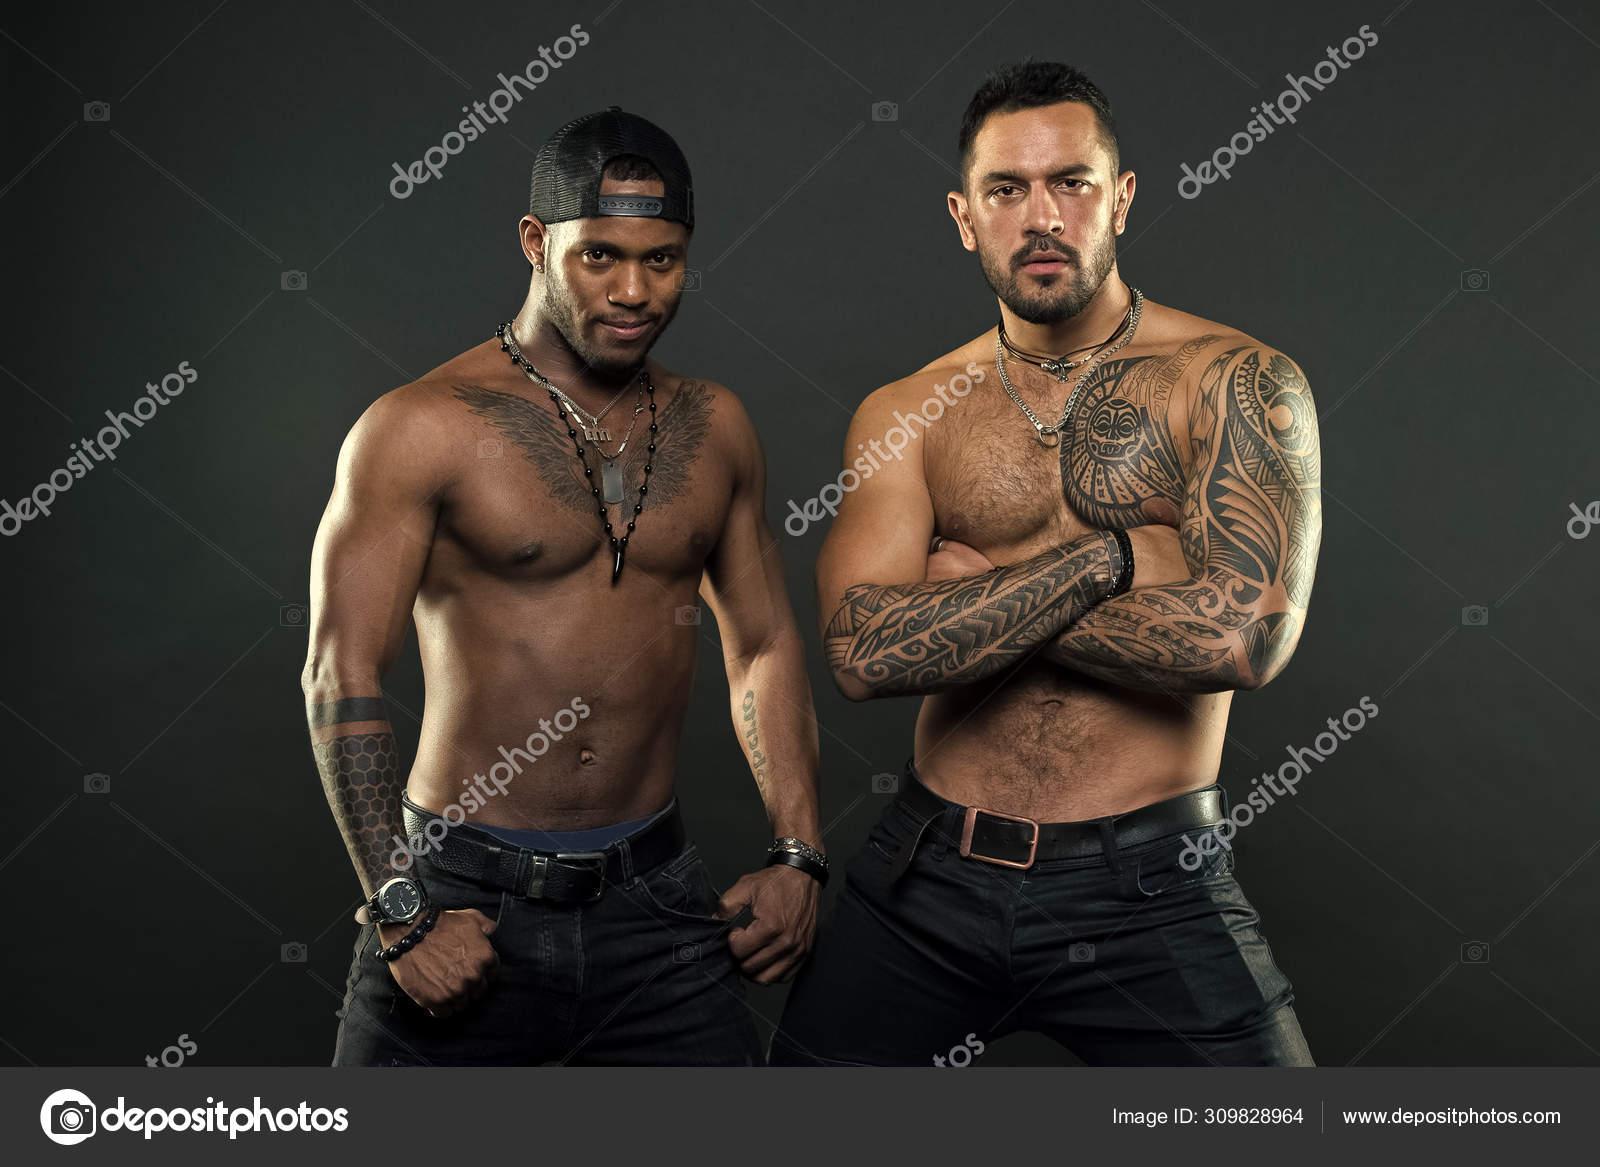 Men tattoo sexy 30+ Hot